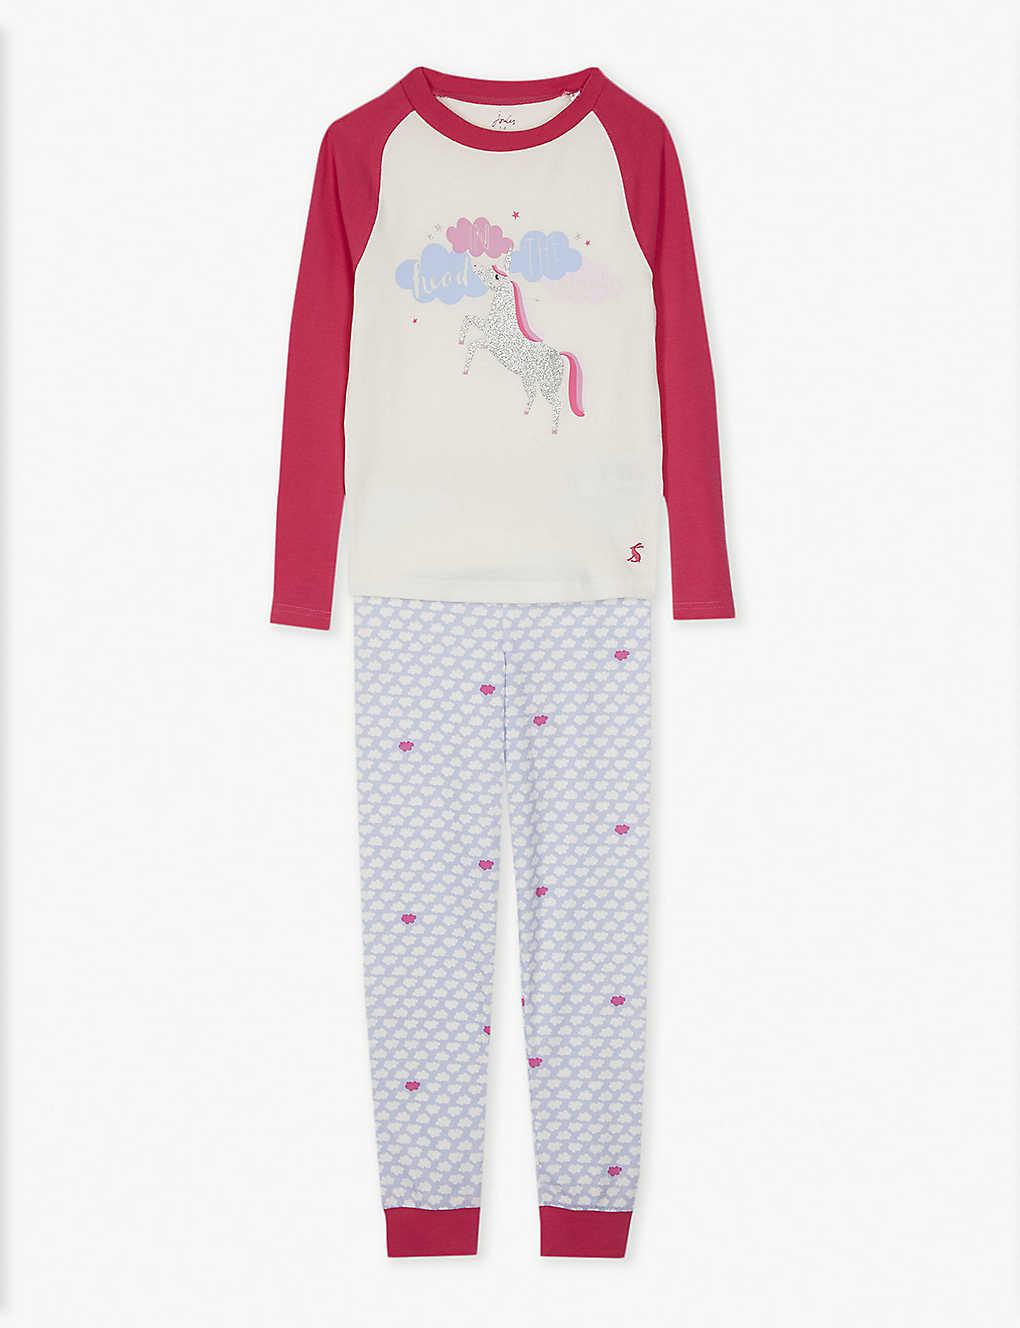 40e63f086 JOULES - Cotton-blend pyjamas 4-12 years | Selfridges.com